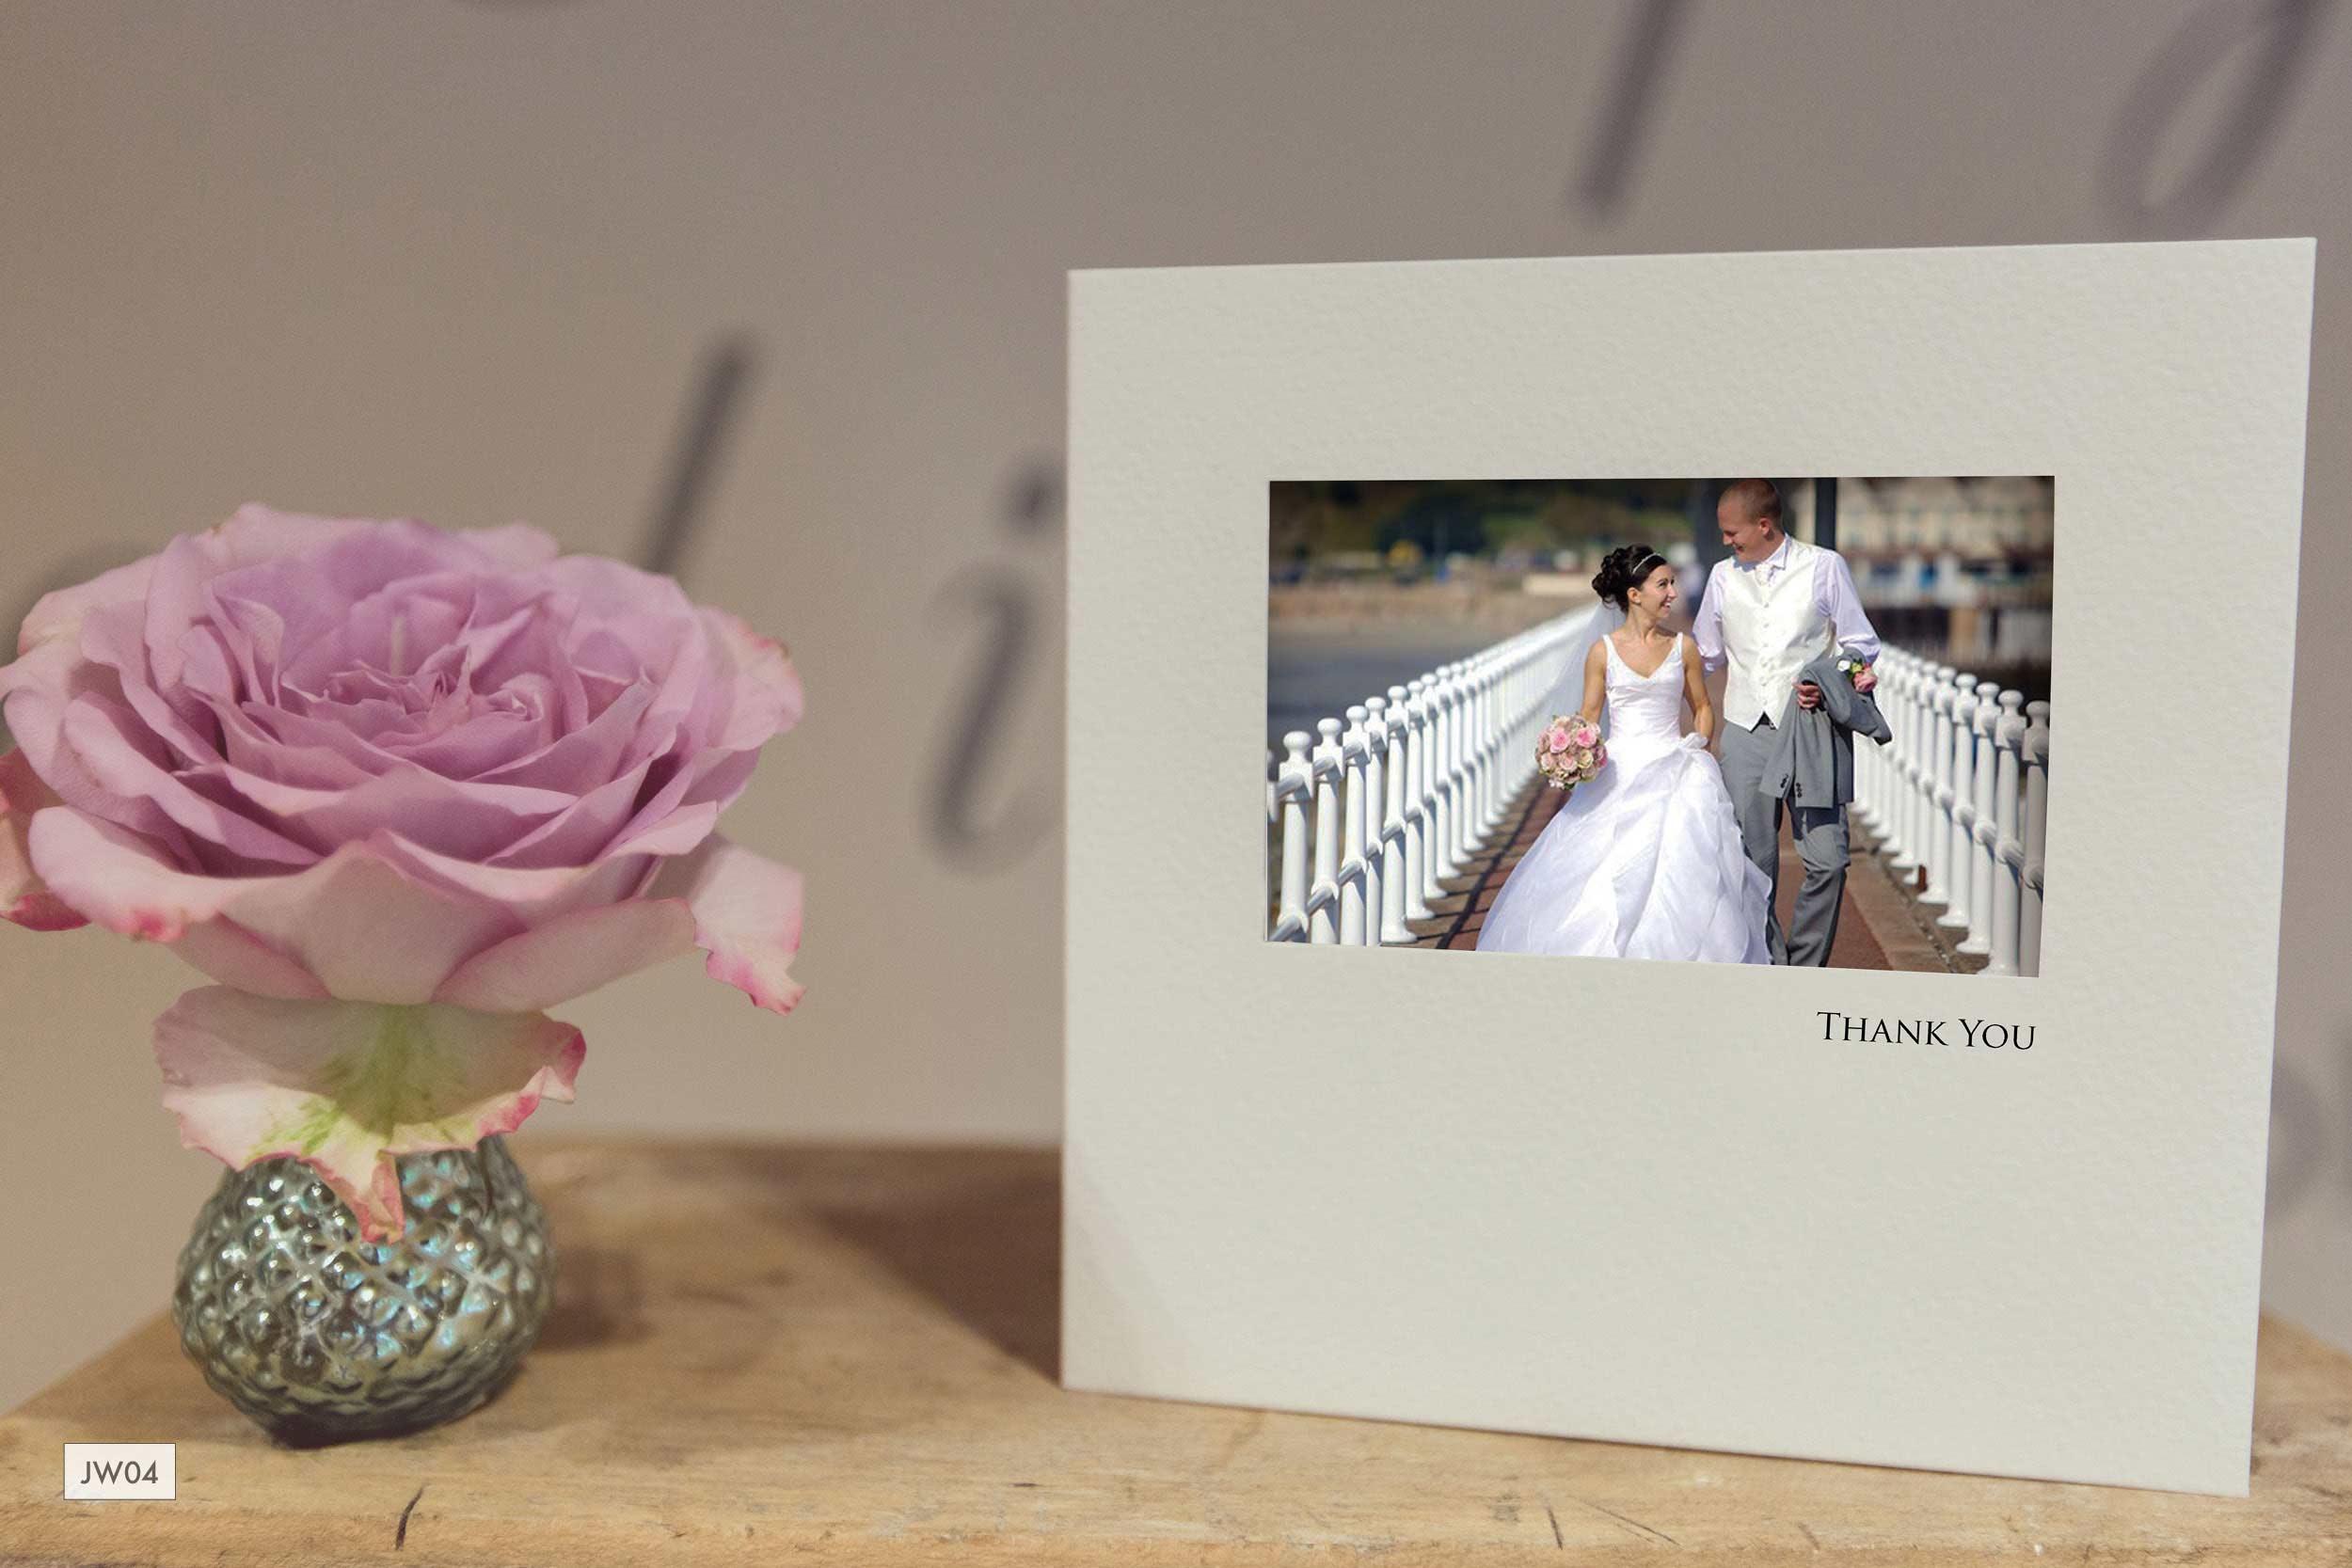 Photographic-thank-you-card_jersey-weddings_ananyacards.com-05.jpg